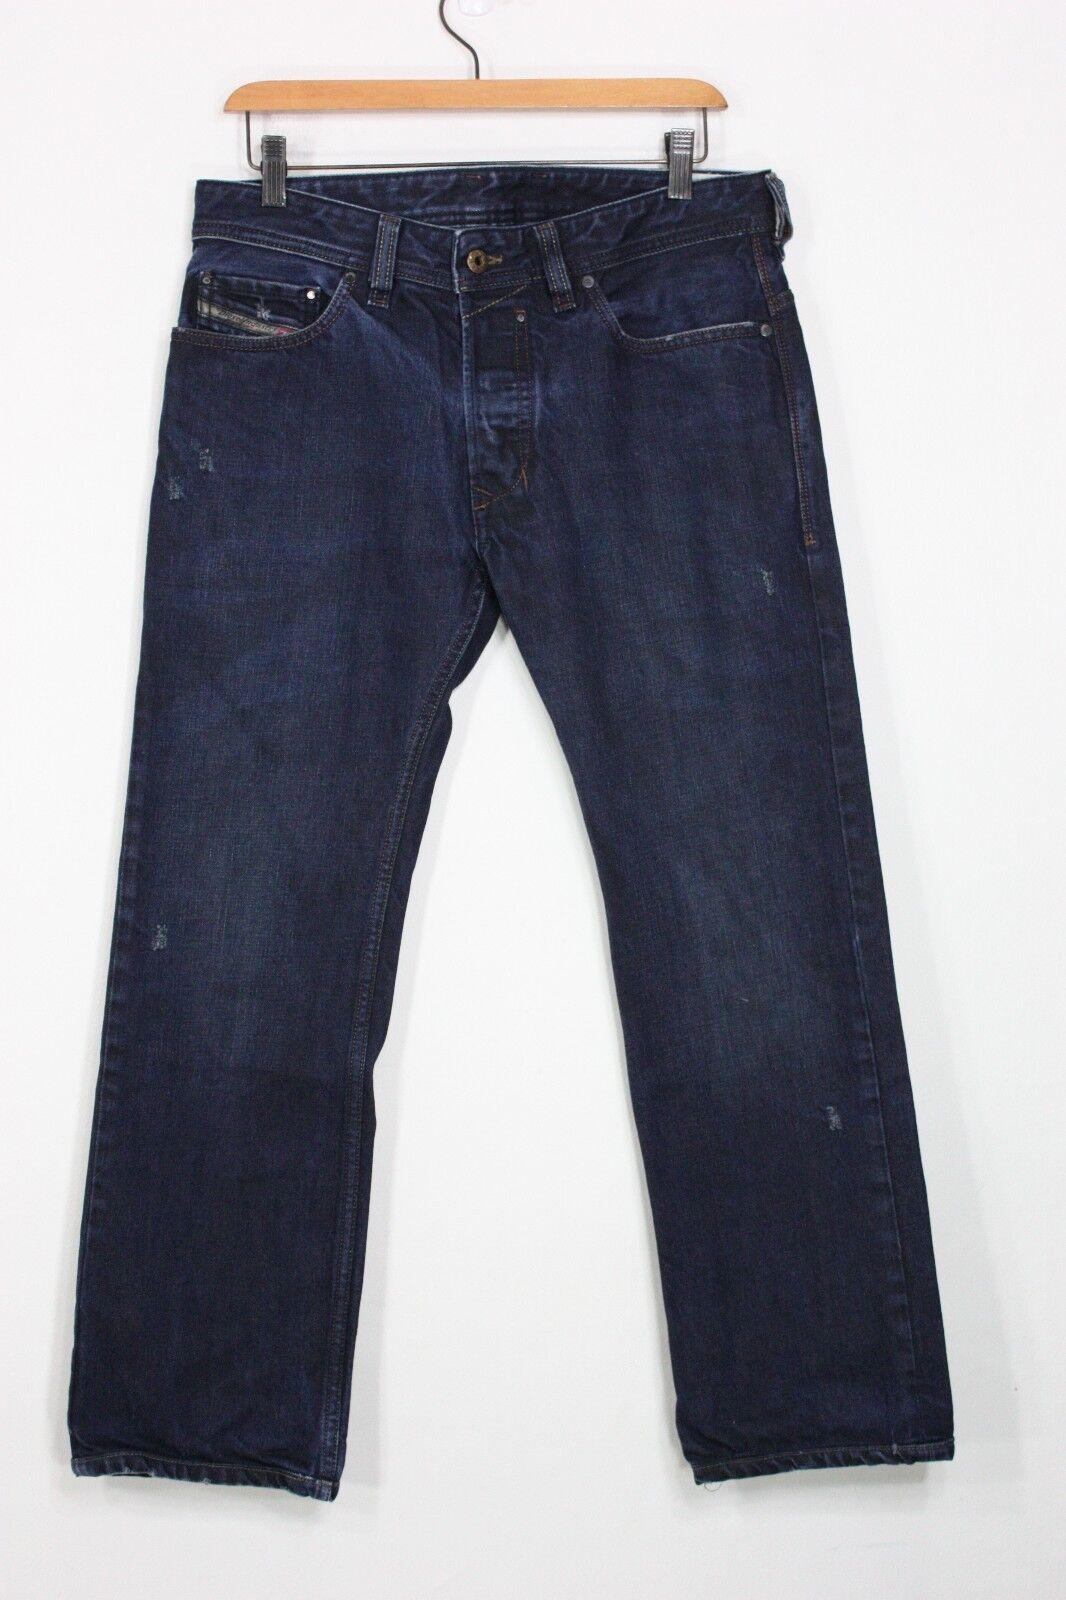 87ada98a02502 Diesel Safado 0806X 3D jeans 31 x 27 slim straight bluee denim noswsl3824- Jeans